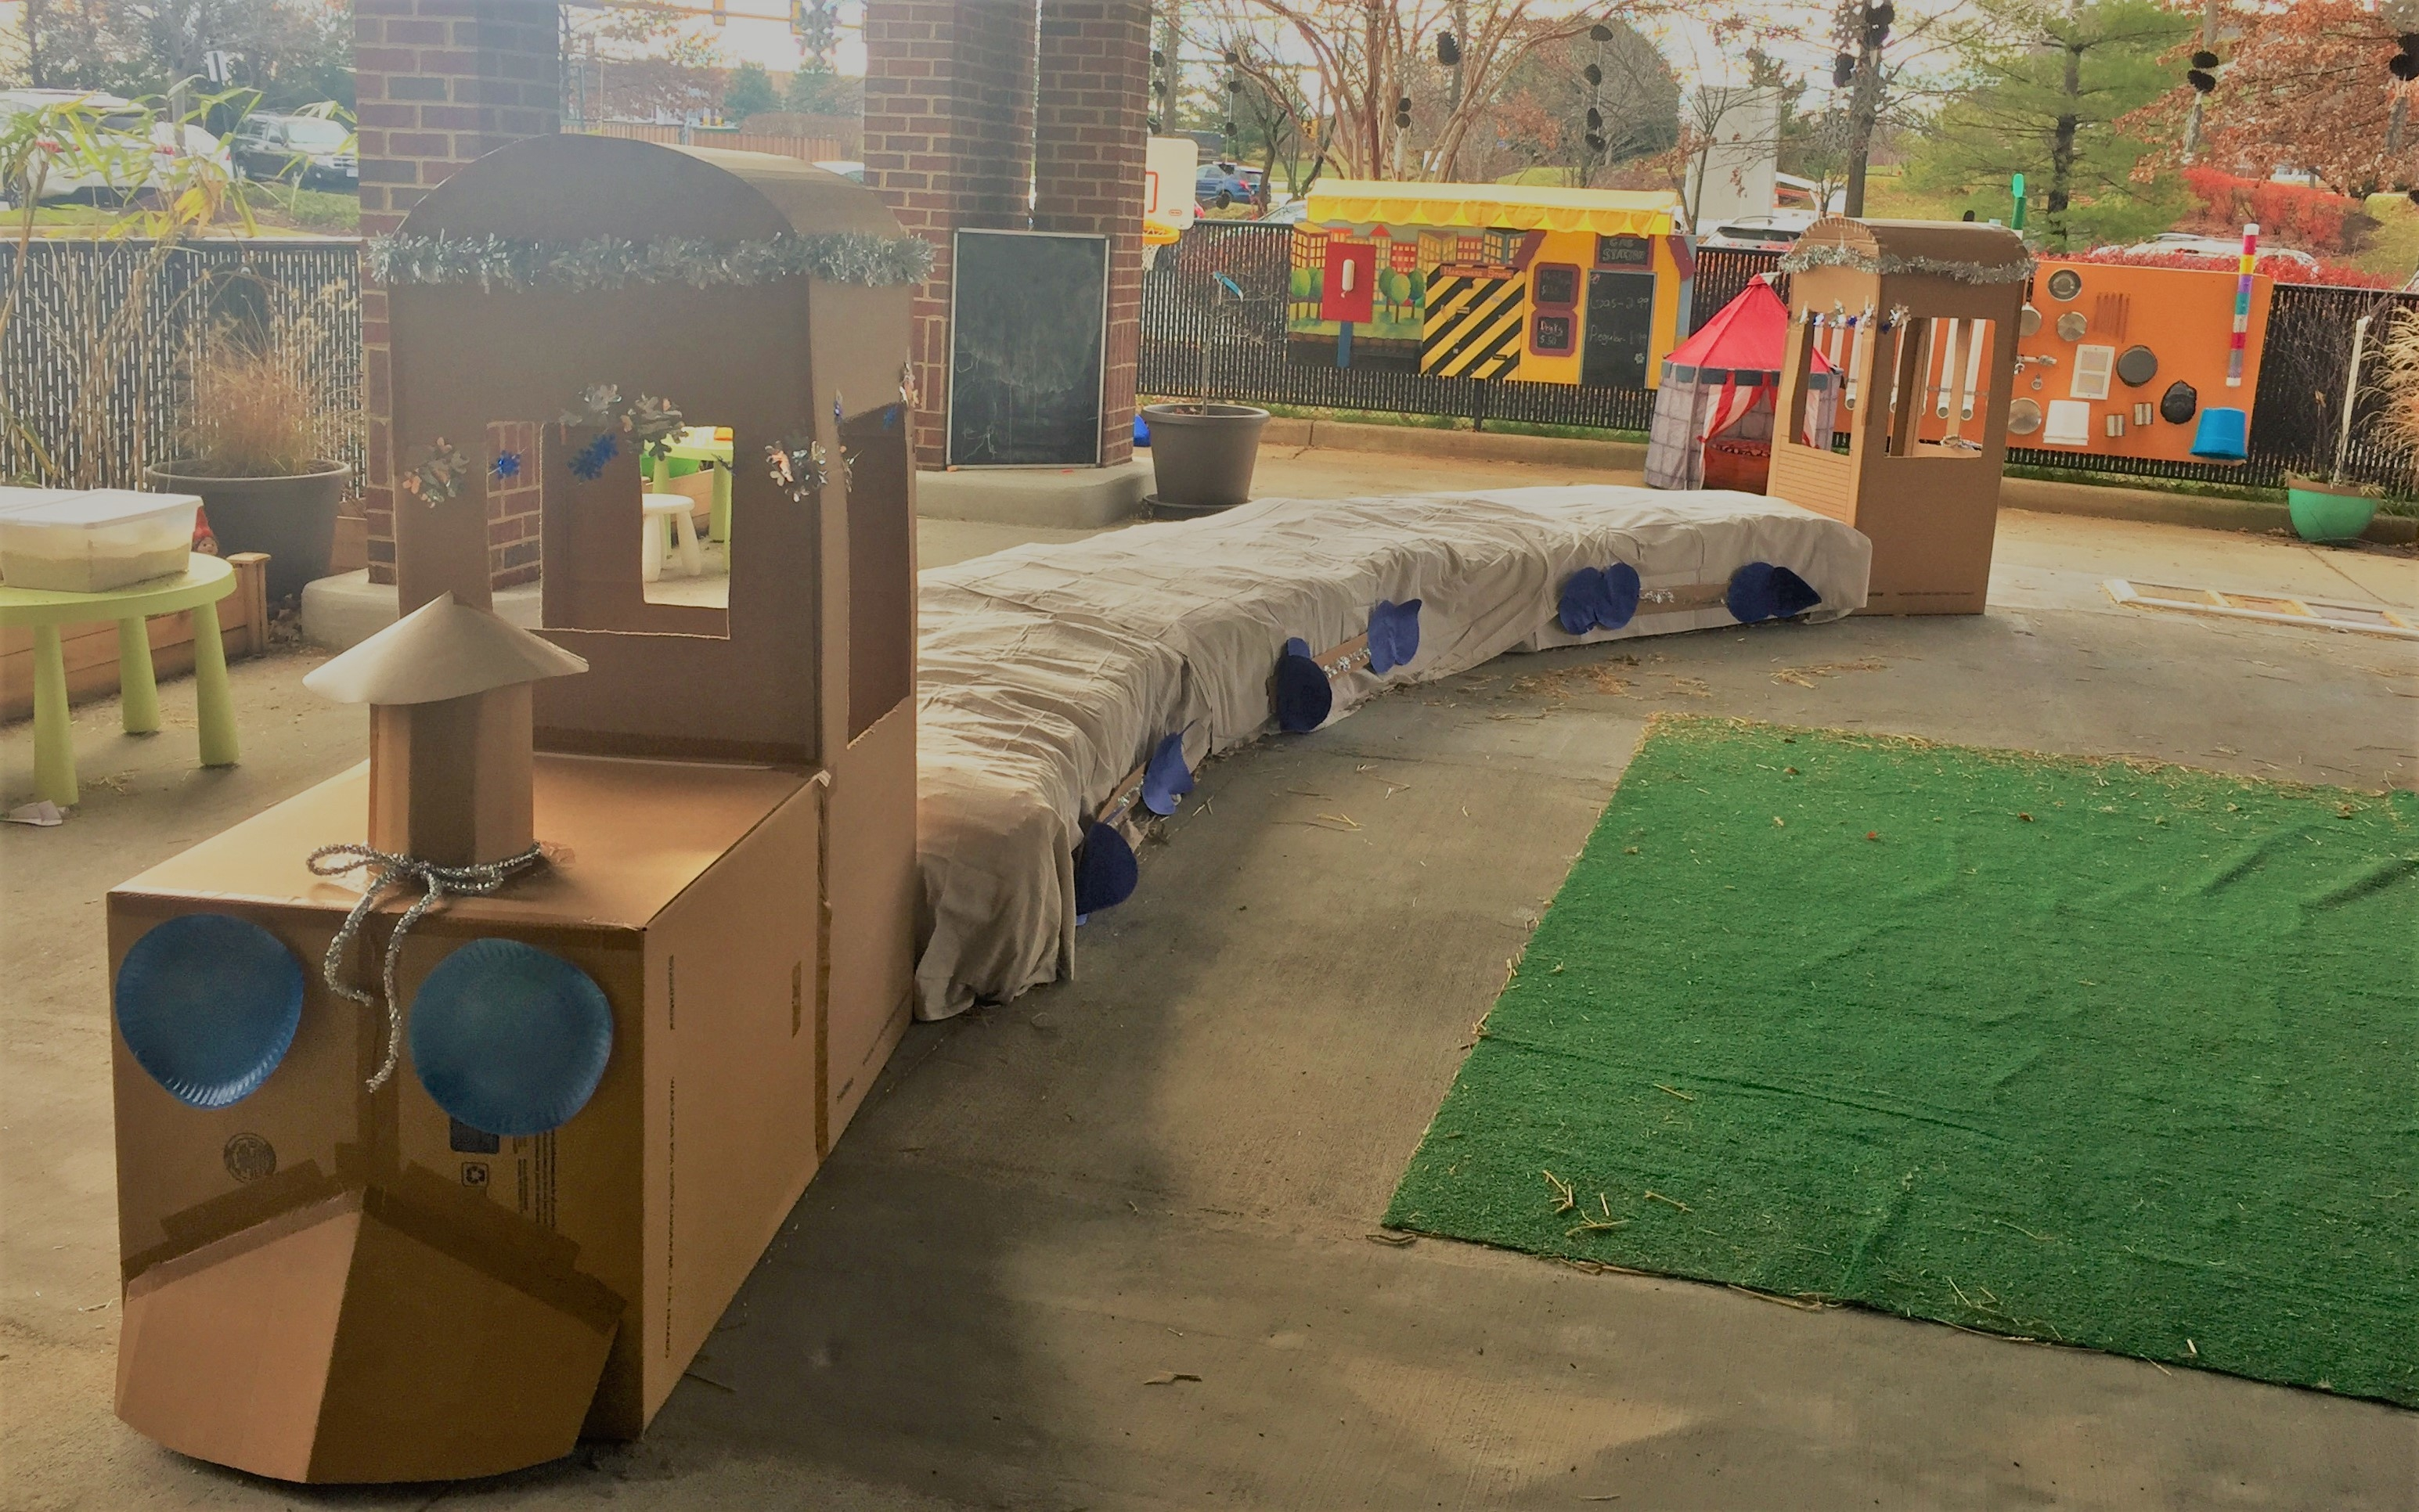 Center Stage Preschool image 31